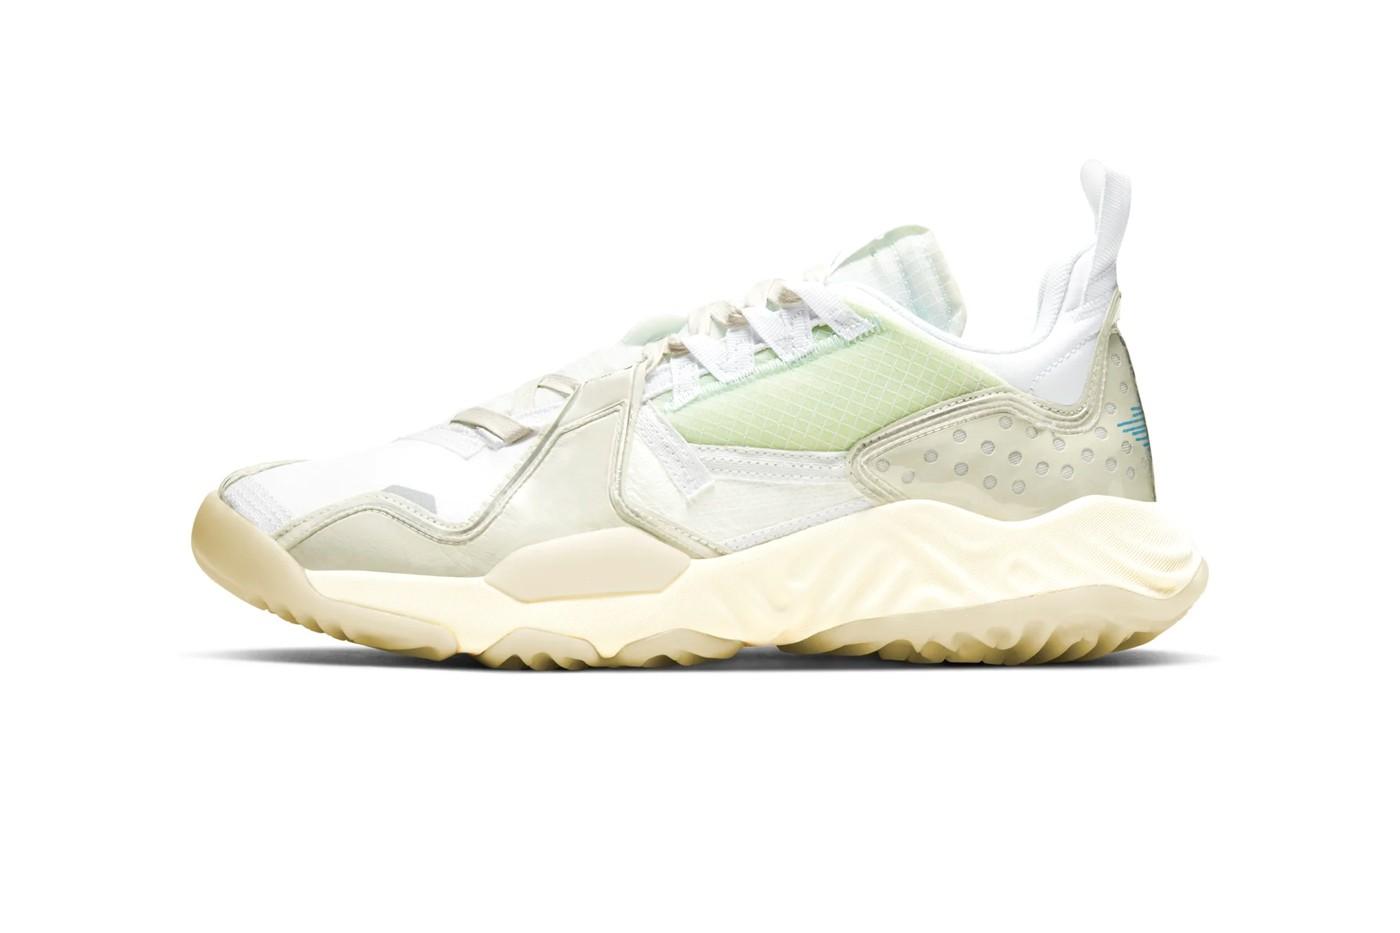 Jordan Brand 全新鞋型 Delta SP「Sail」配色即将正式发布